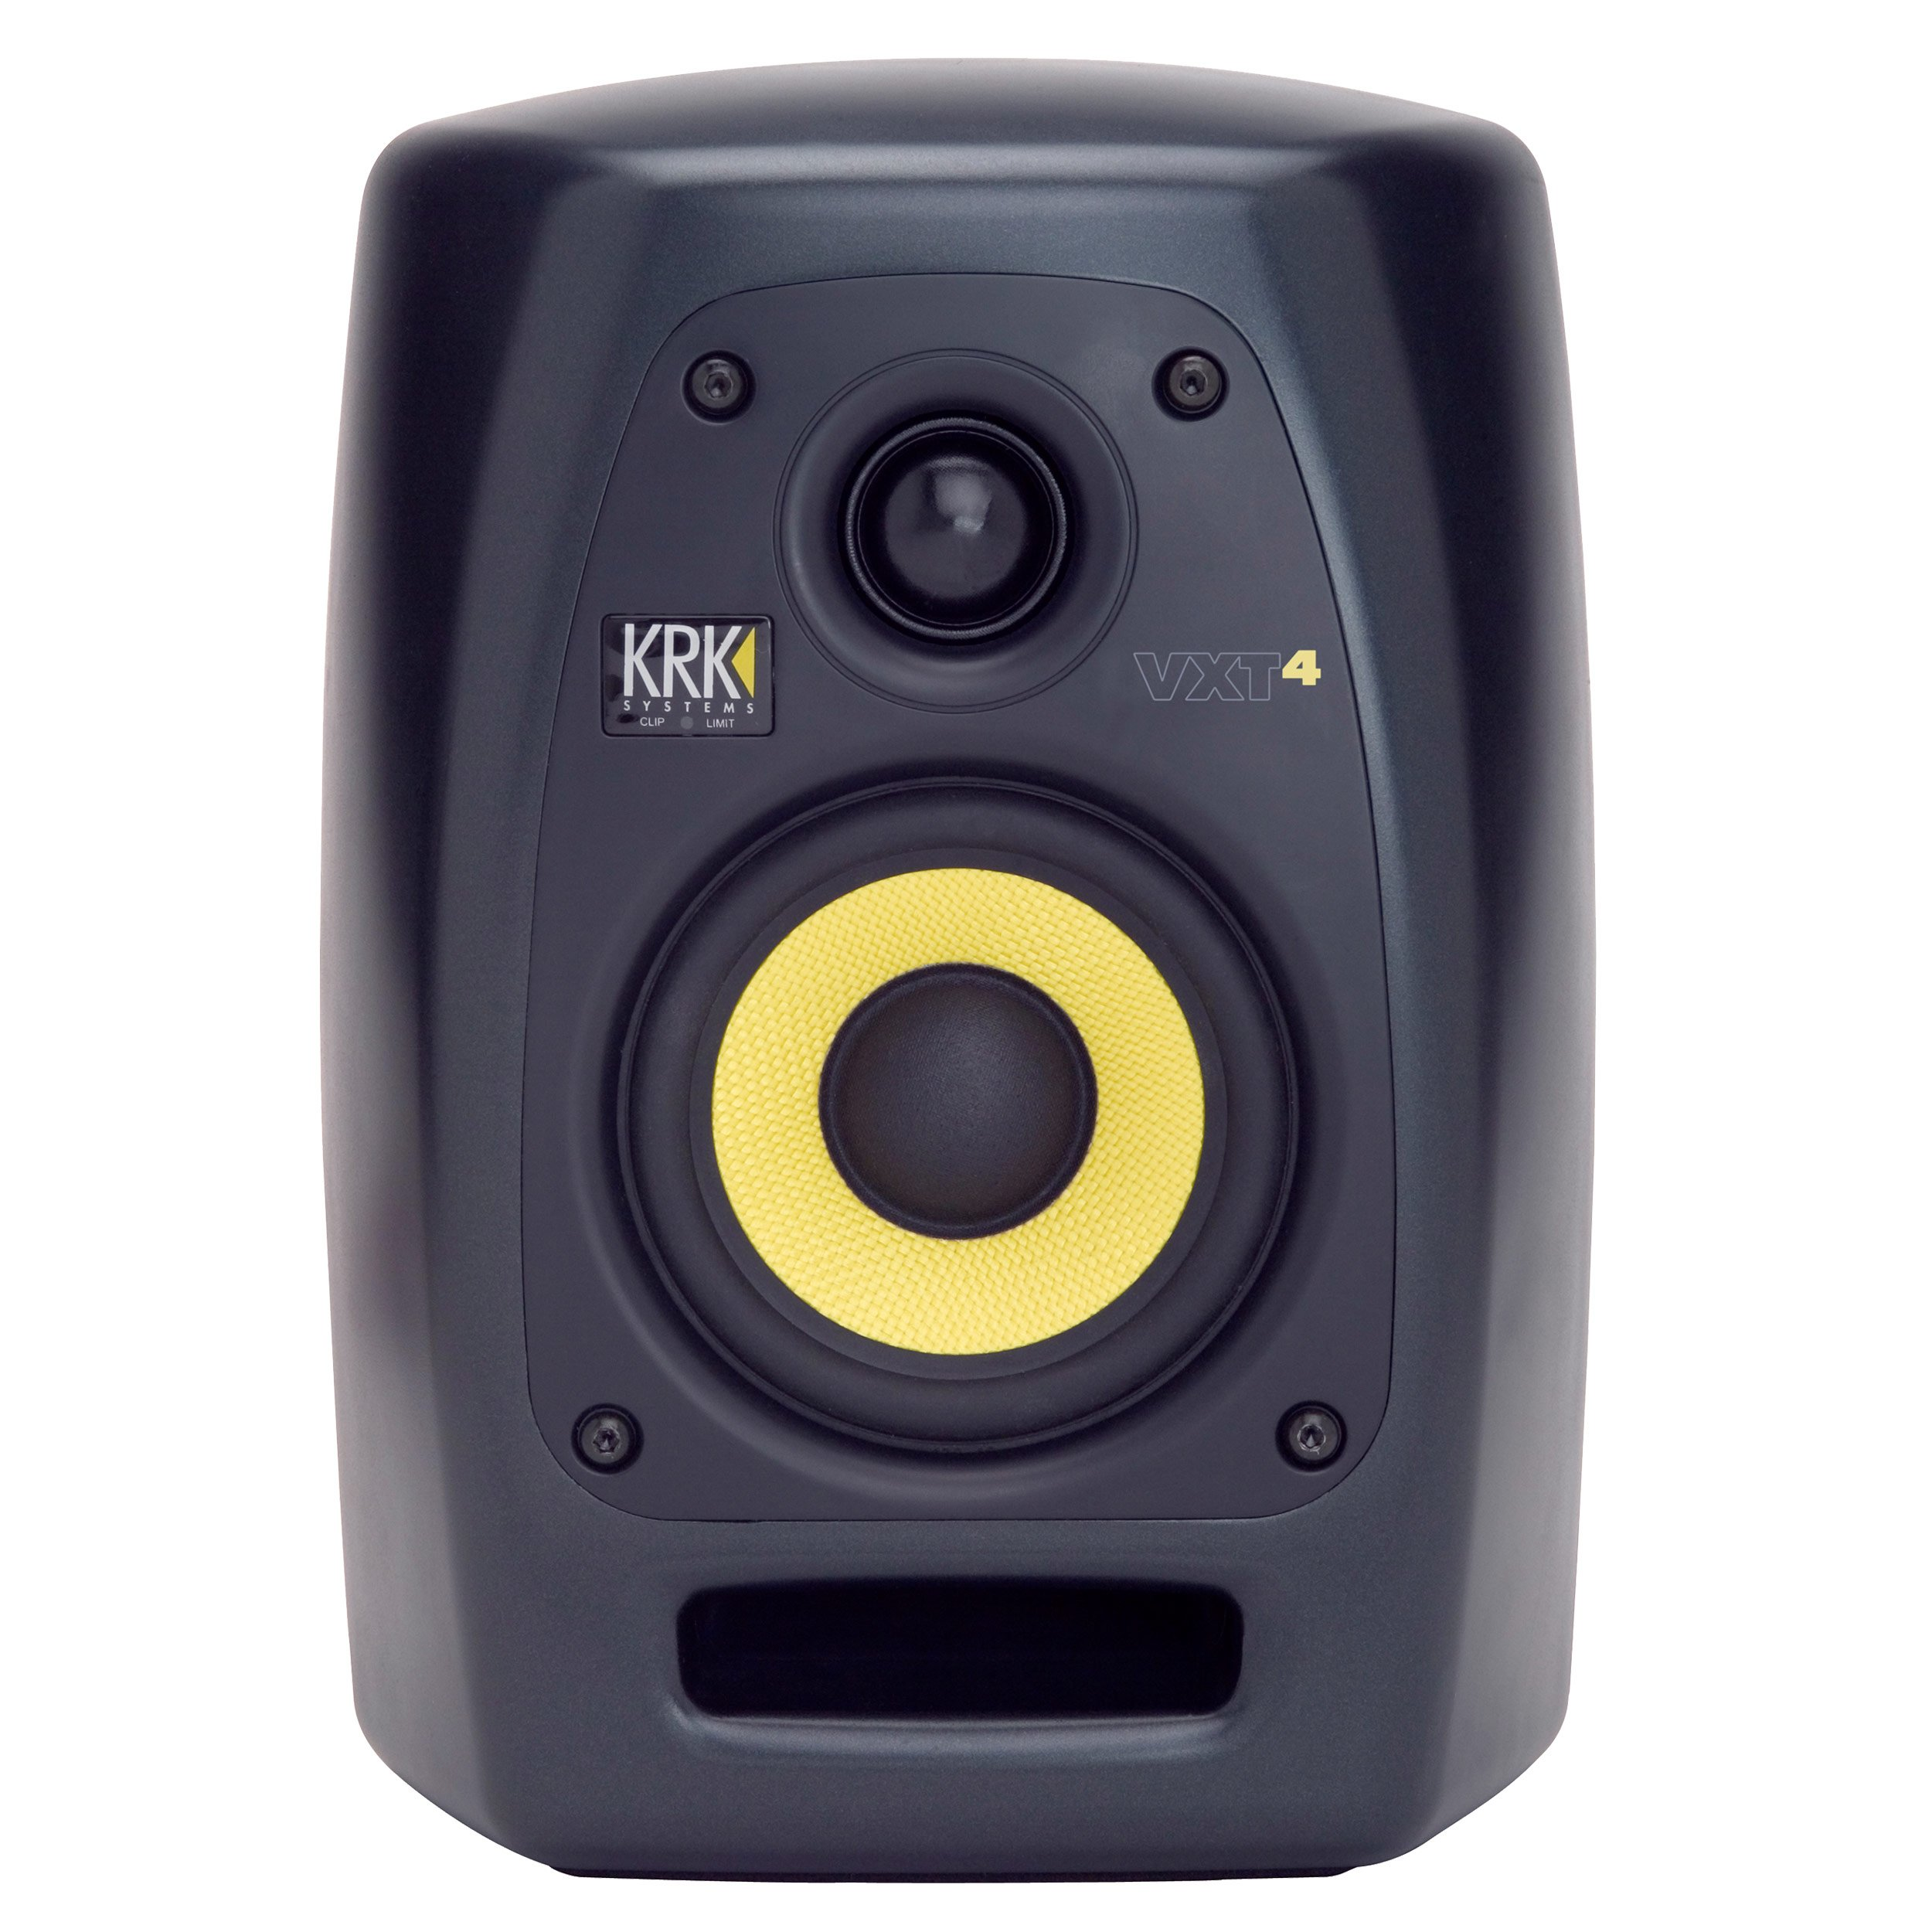 KRK VXT4 Active Studio Monitor - 4 Inch, 45 Watts by KRK (Image #1)